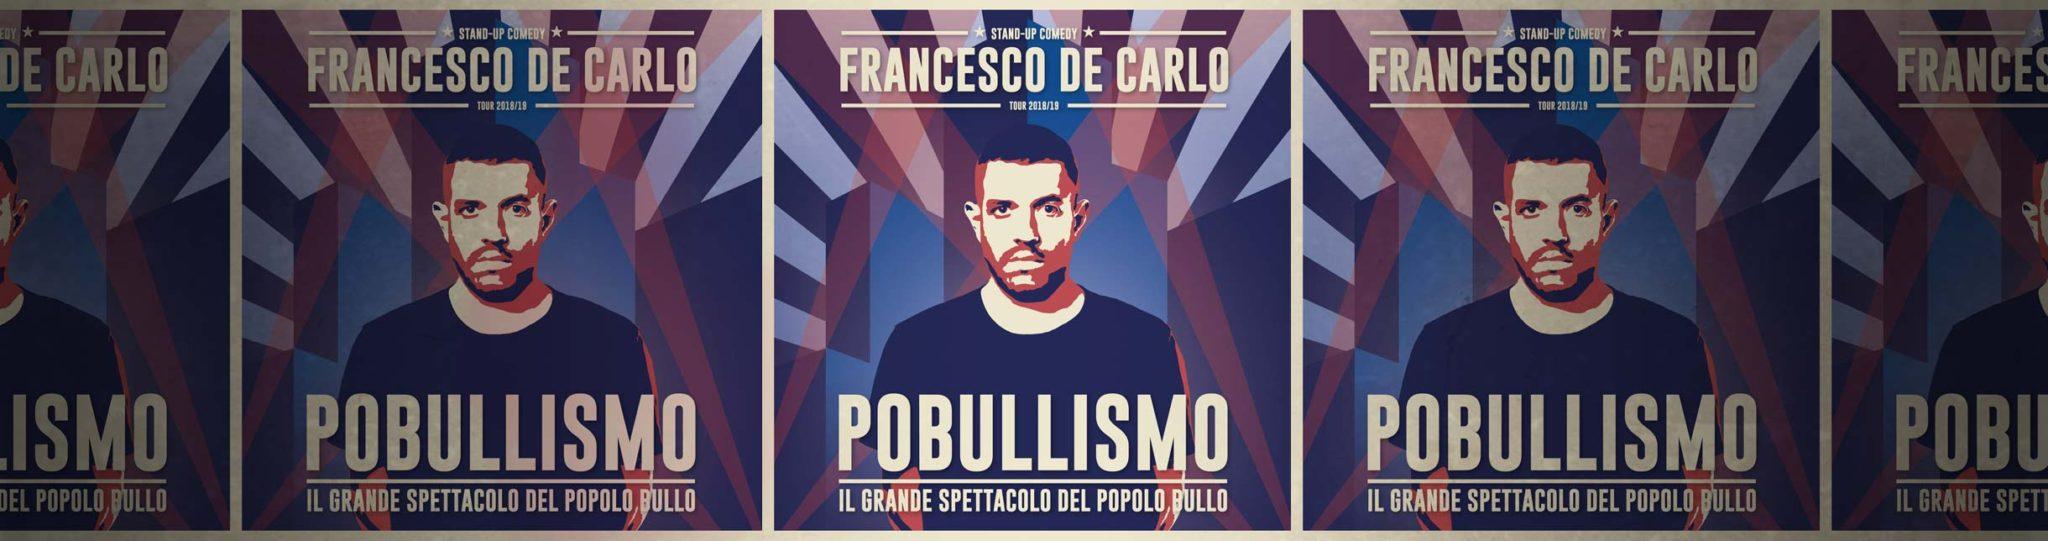 Francesco De Carlo Pobullismo